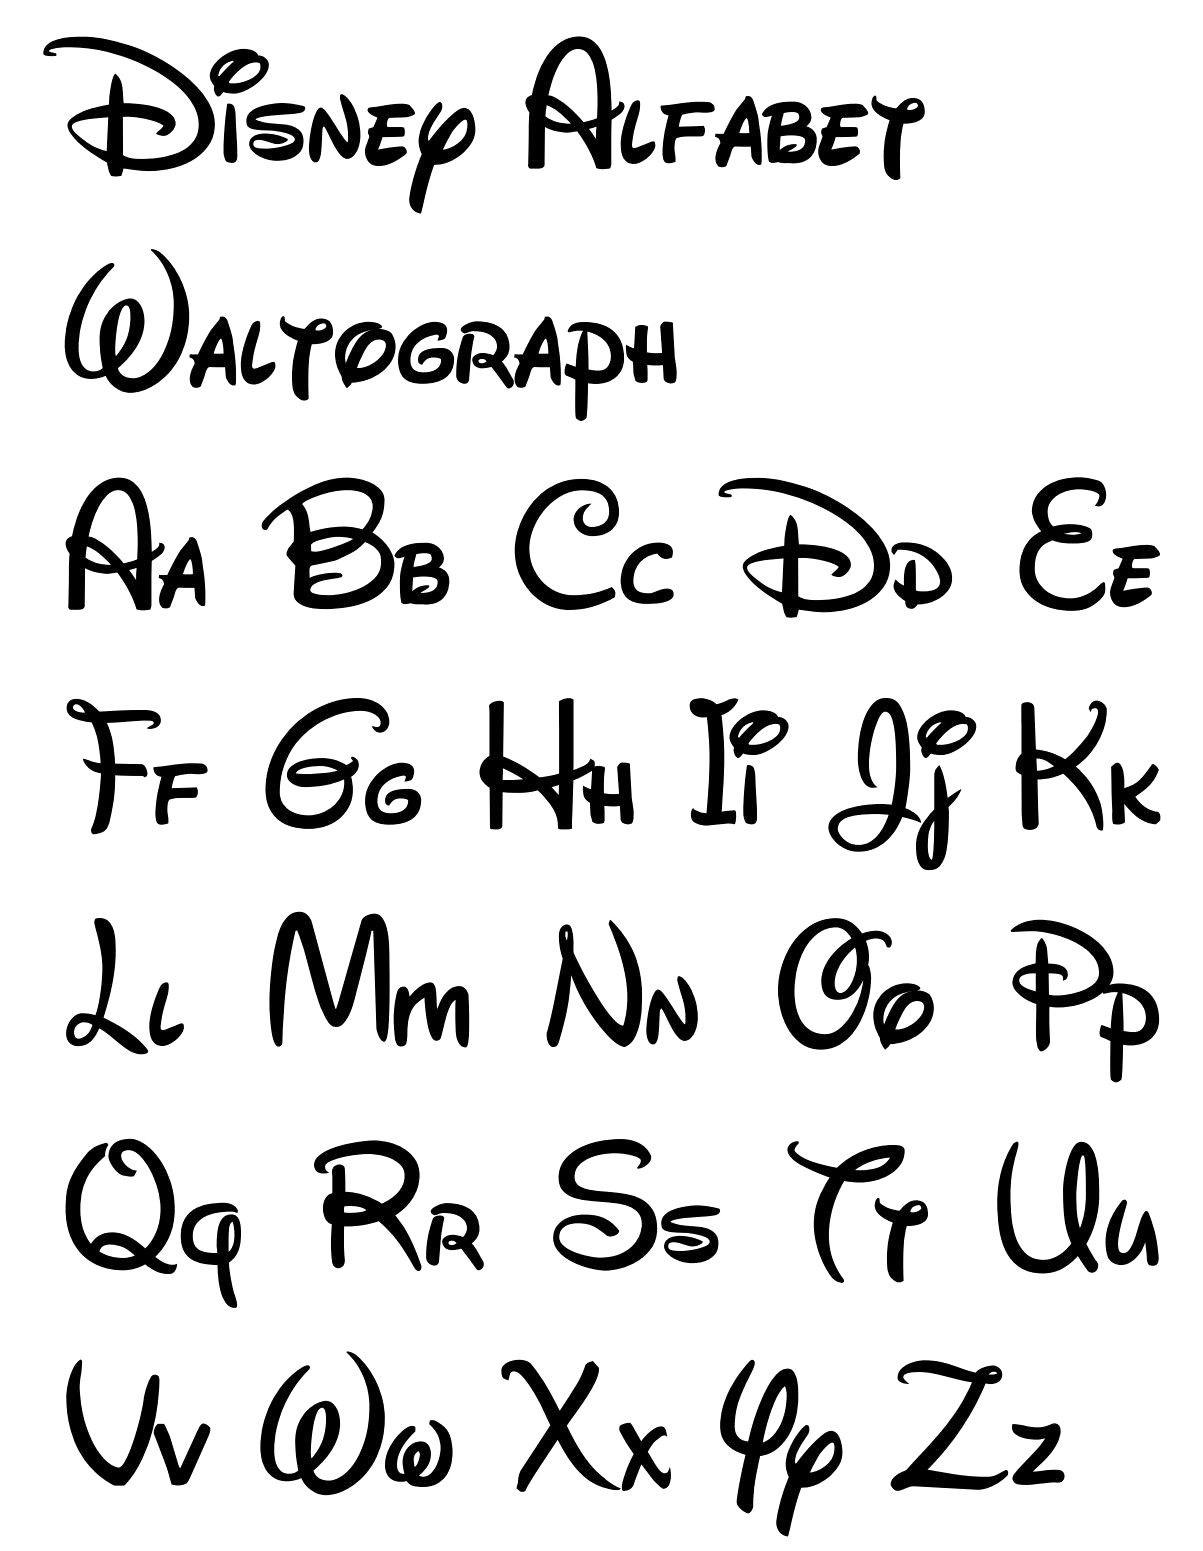 Free Printable Disney Letter Stencils | Disney In 2019 | Disney - Free Printable Disney Font Stencils